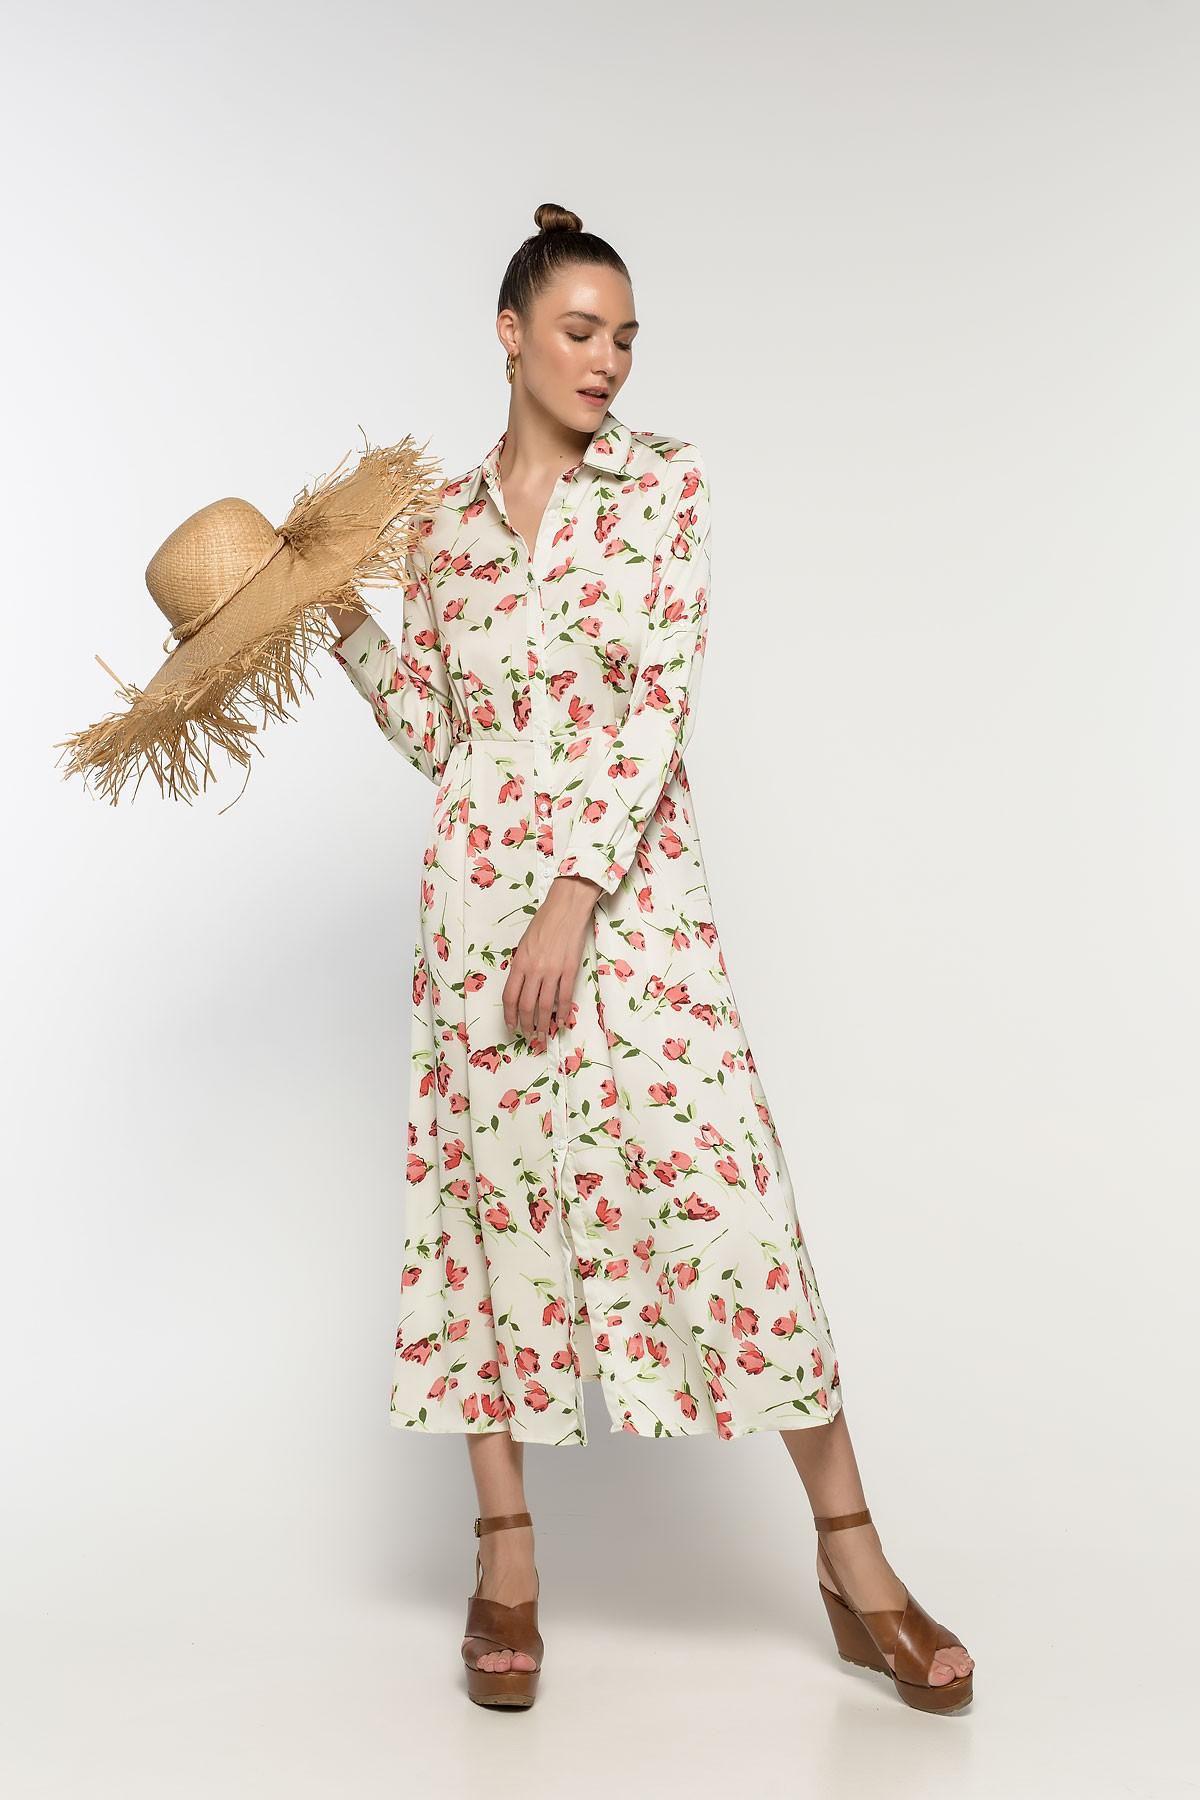 1fc8fe2f5fdb Φόρεμα-πουκαμισα φλοραλ - Bettina Stores Bettina Stores